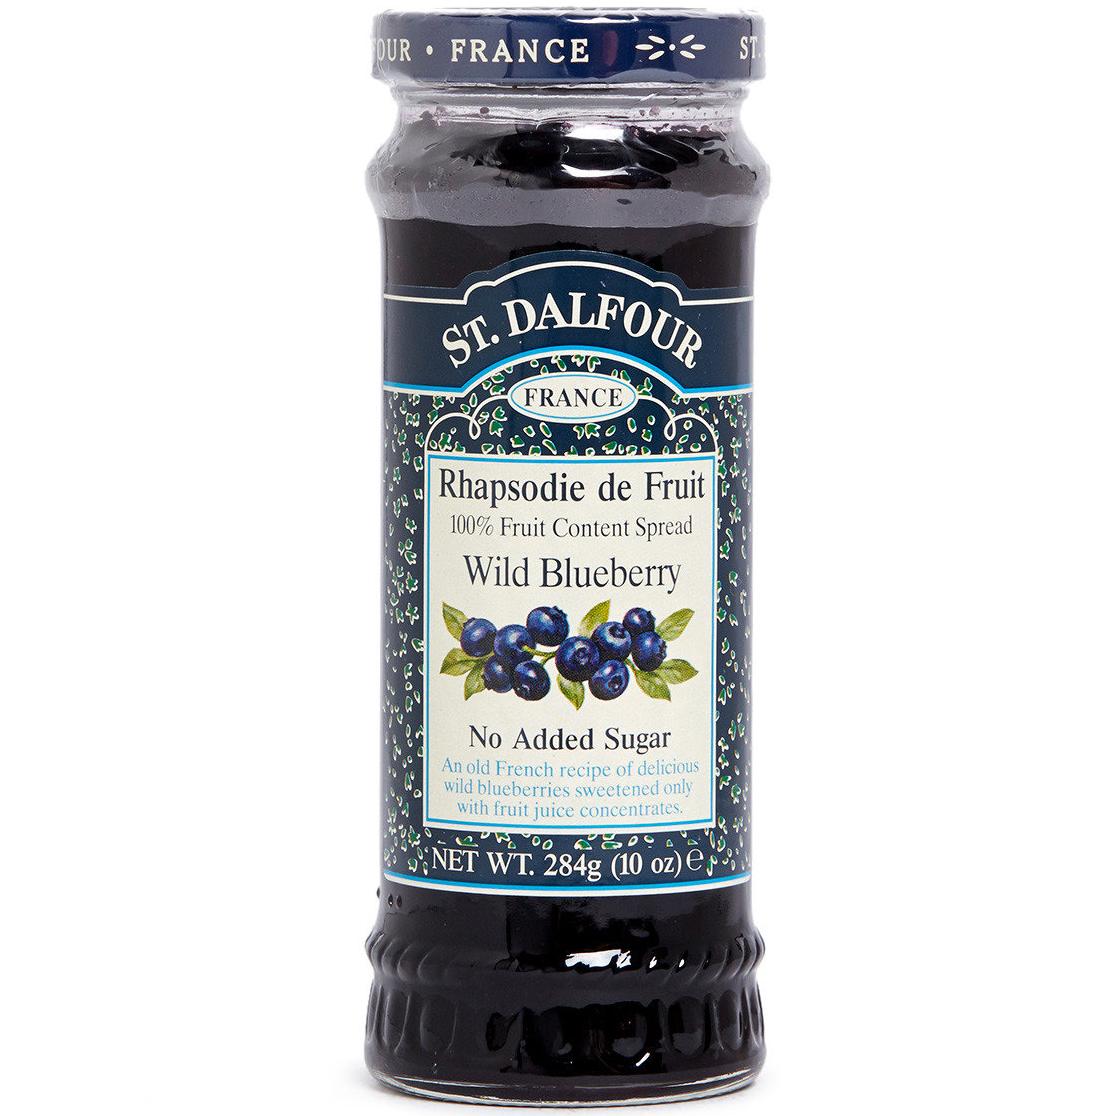 ST.DALFOUR - FRANCE WILD BLUEBERRY 100% FRUIT - NATURAL - NO SUGAR - NON GMO - 10oz